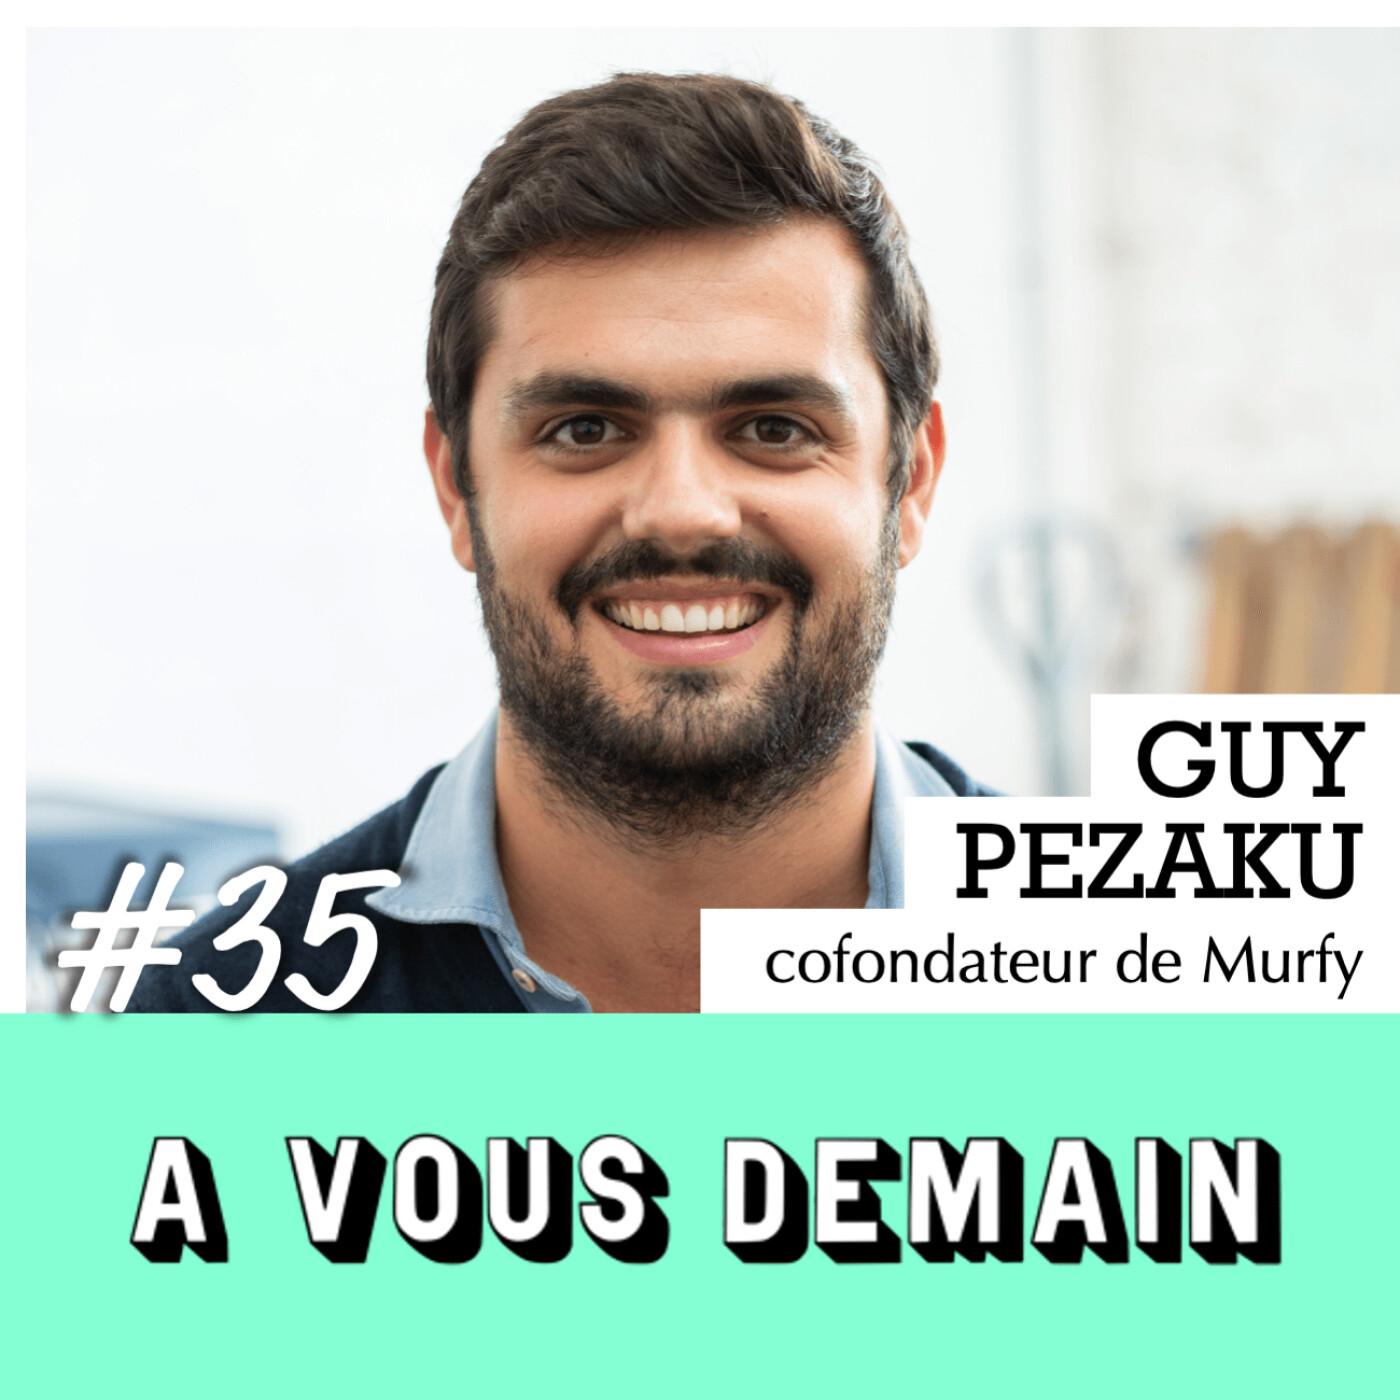 #35 | Guy Pezaku (Murfy) : réparer pour ne plus jeter